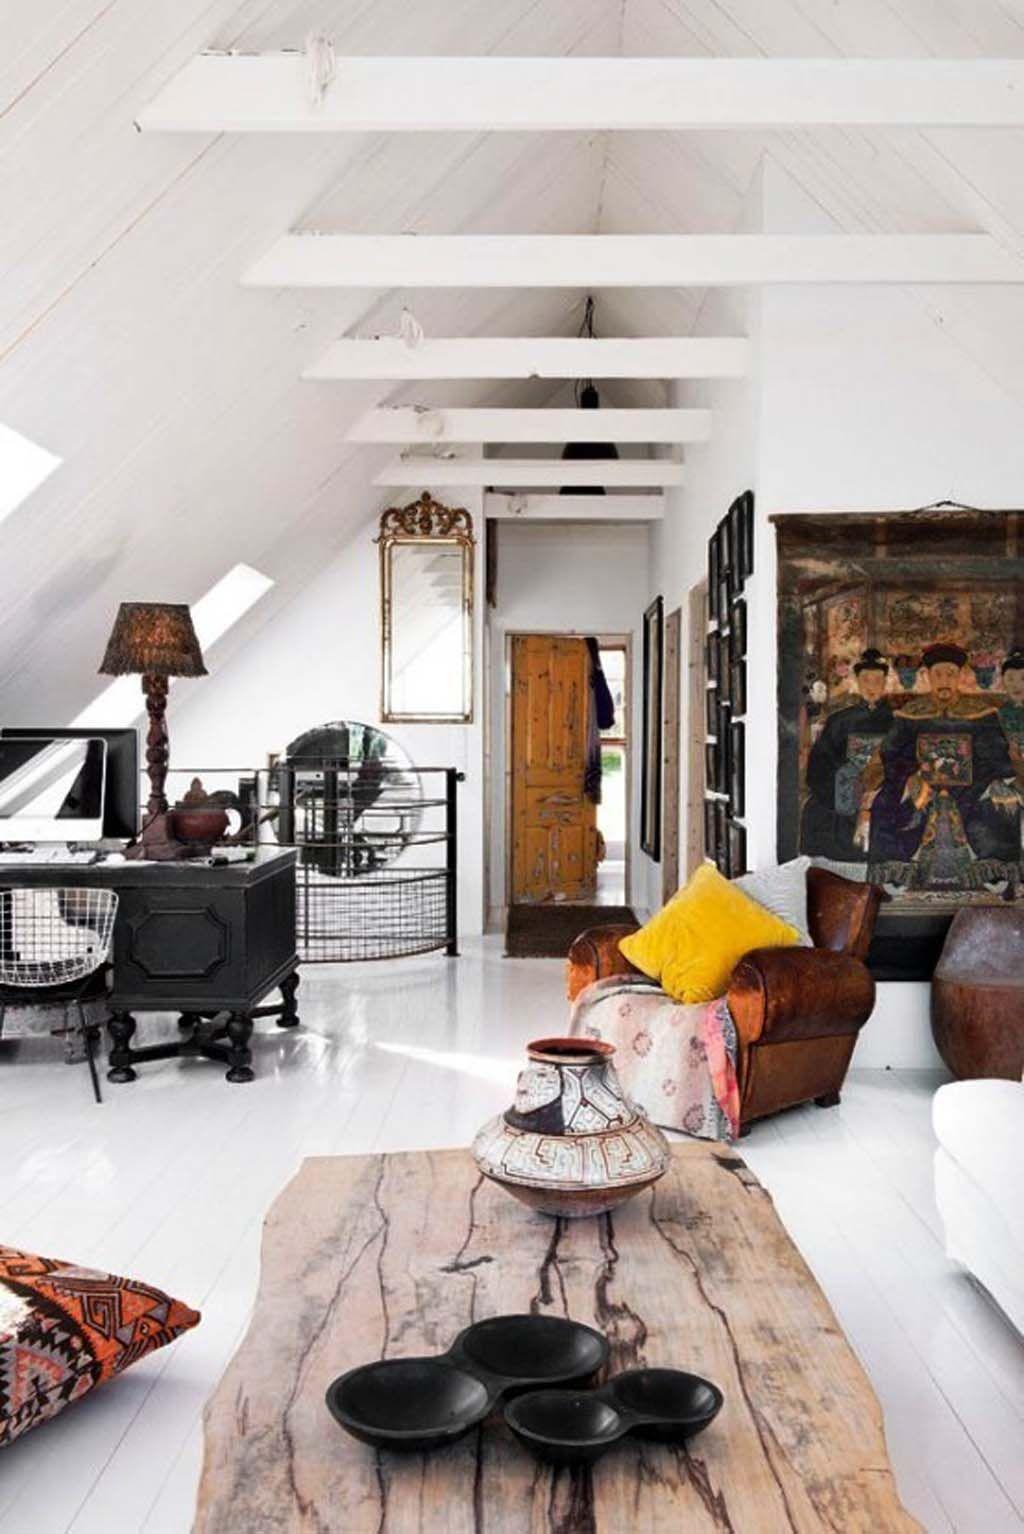 Retro with Antiques Swedish Interior Design Swedish Interiors Vintage Interior Design Asian Interior & 5 Steps For A Perfect Swedish Interior Design | decor | Pinterest ...